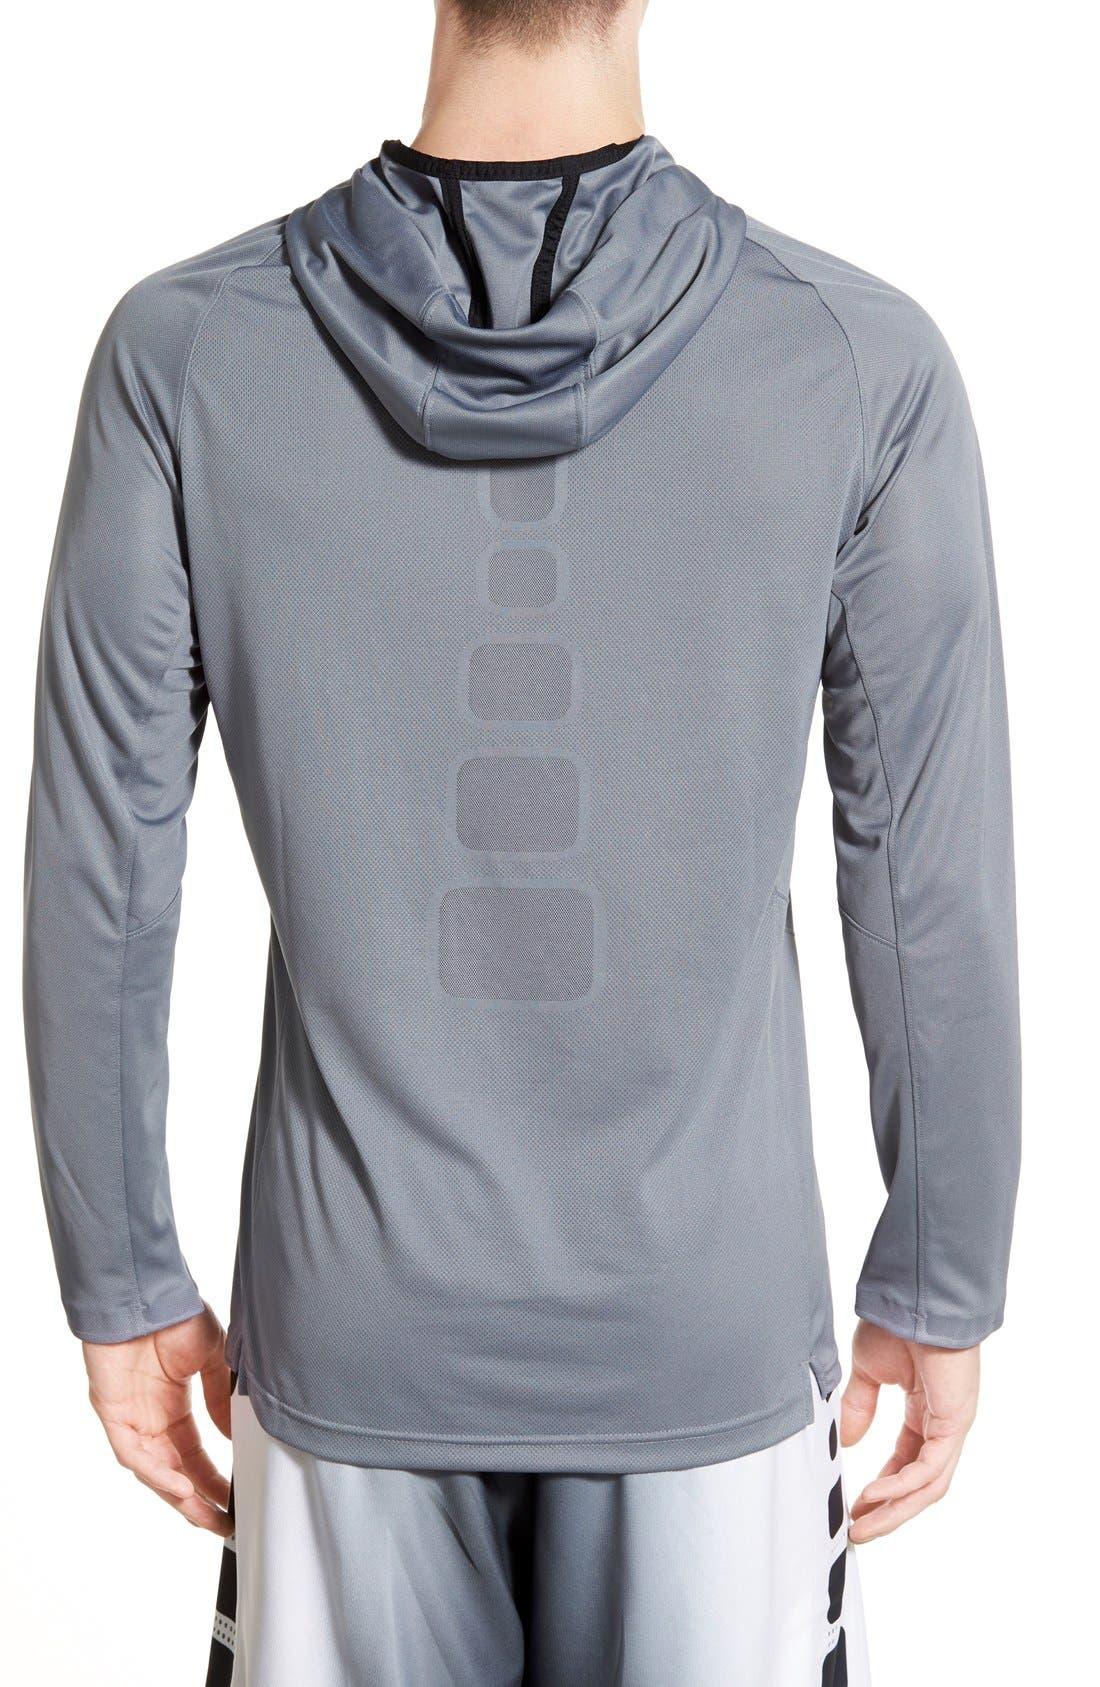 Alternate Image 2  - Nike 'Elite Shooter - Dri-FIT' Long Sleeve Hooded Basketball Shirt